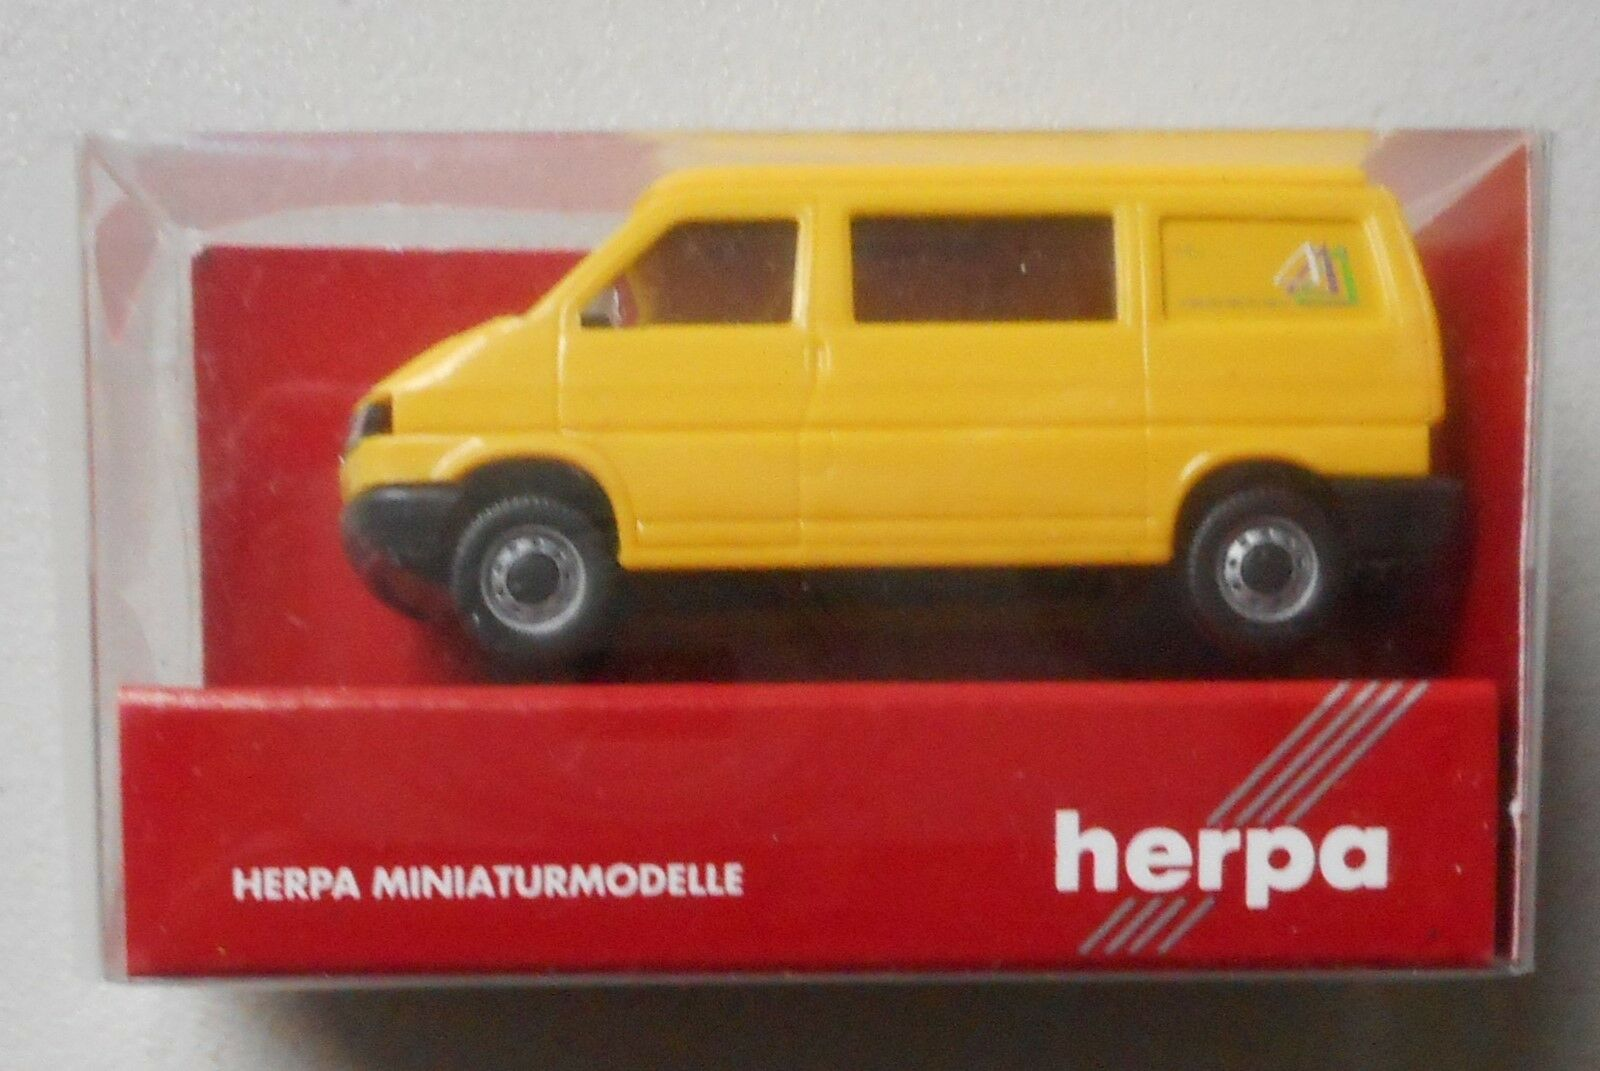 YELLOW VW VOLKSWAGEN MOTOR HOME HERPA 1/87 Plastic Miniature VEHICLE HO  Scale